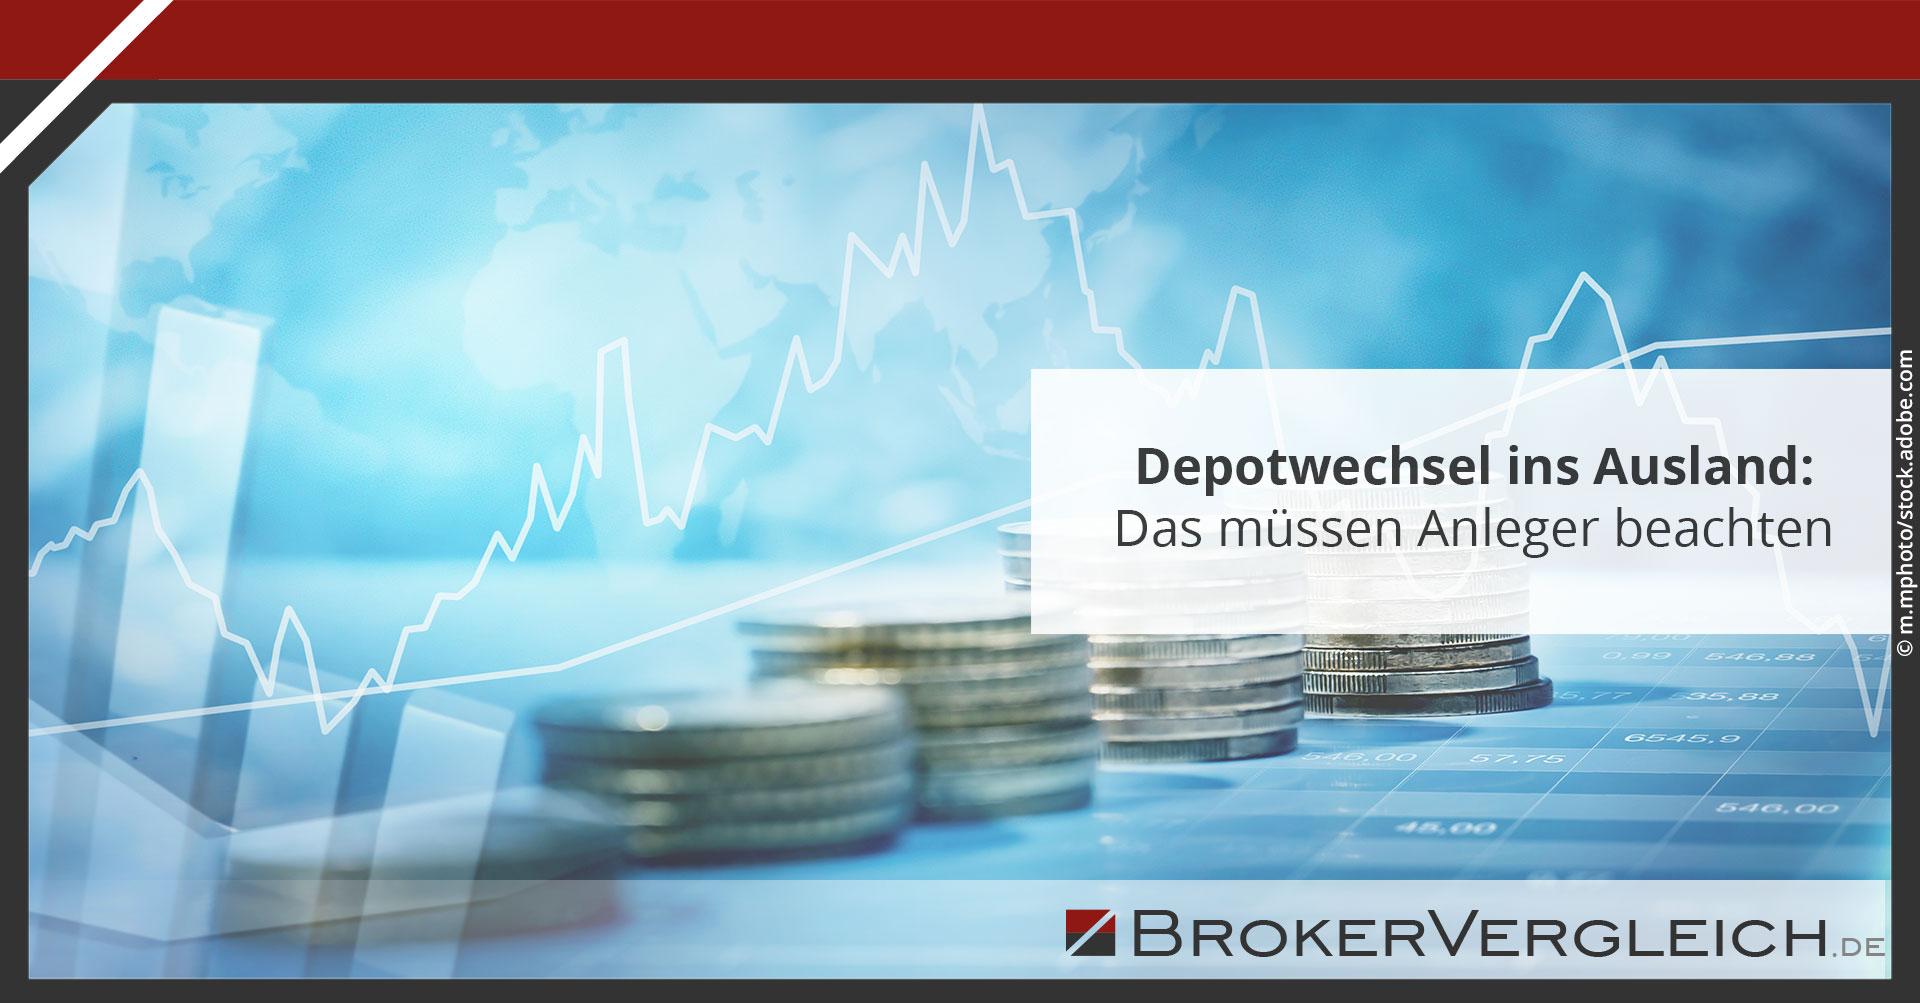 Zum Beitrag - Depotwechsel ins Ausland: Das müssen Anleger beachten